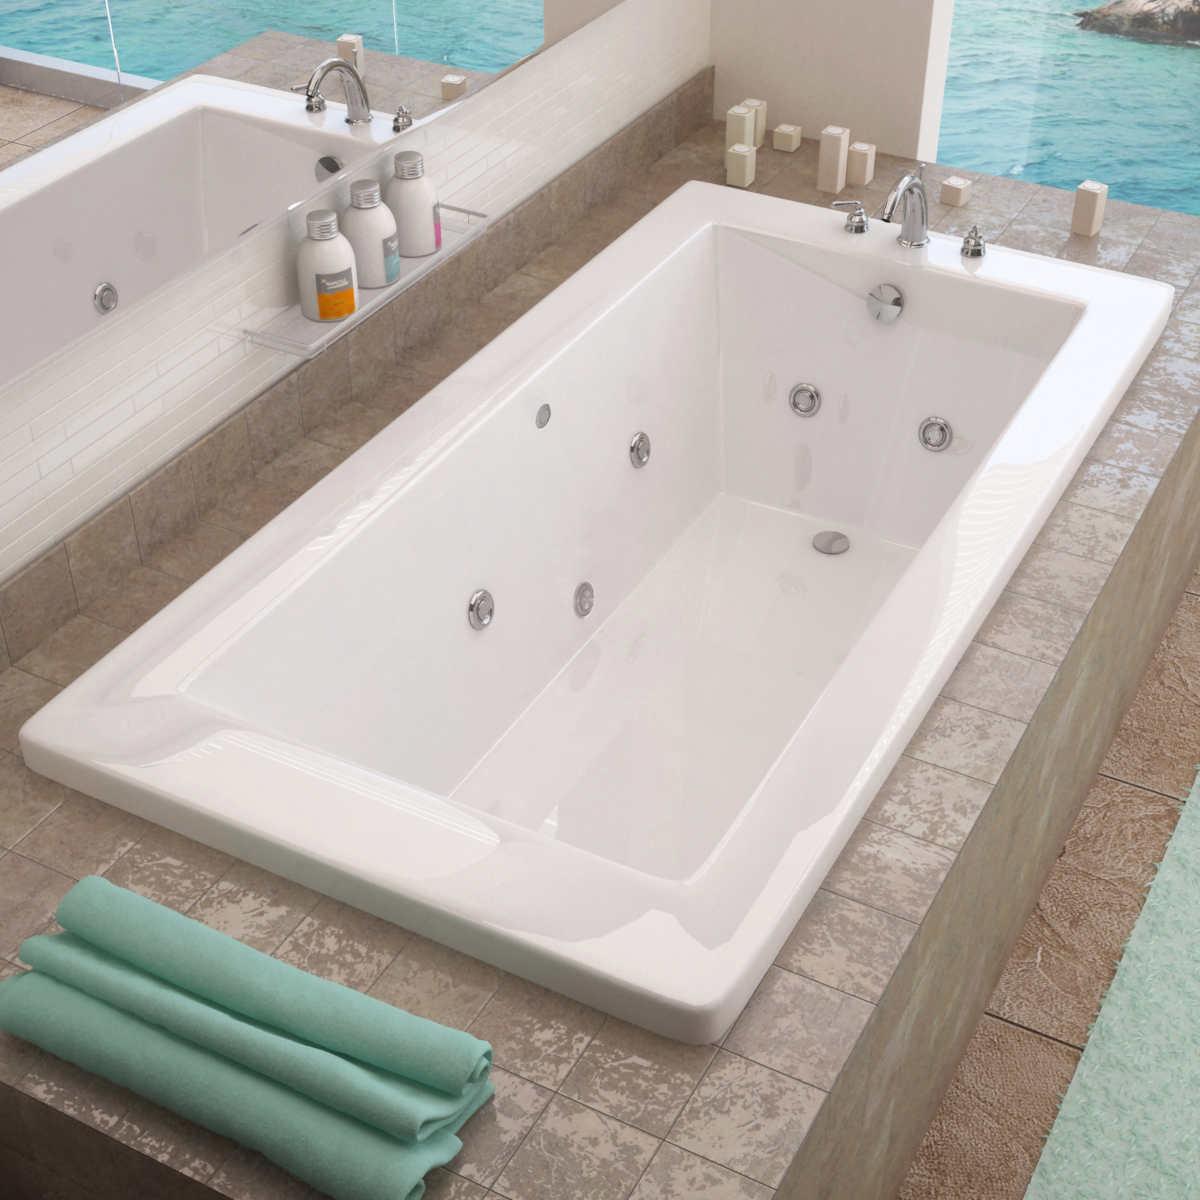 Access Tubs Venetian Whirlpool System Bathtub